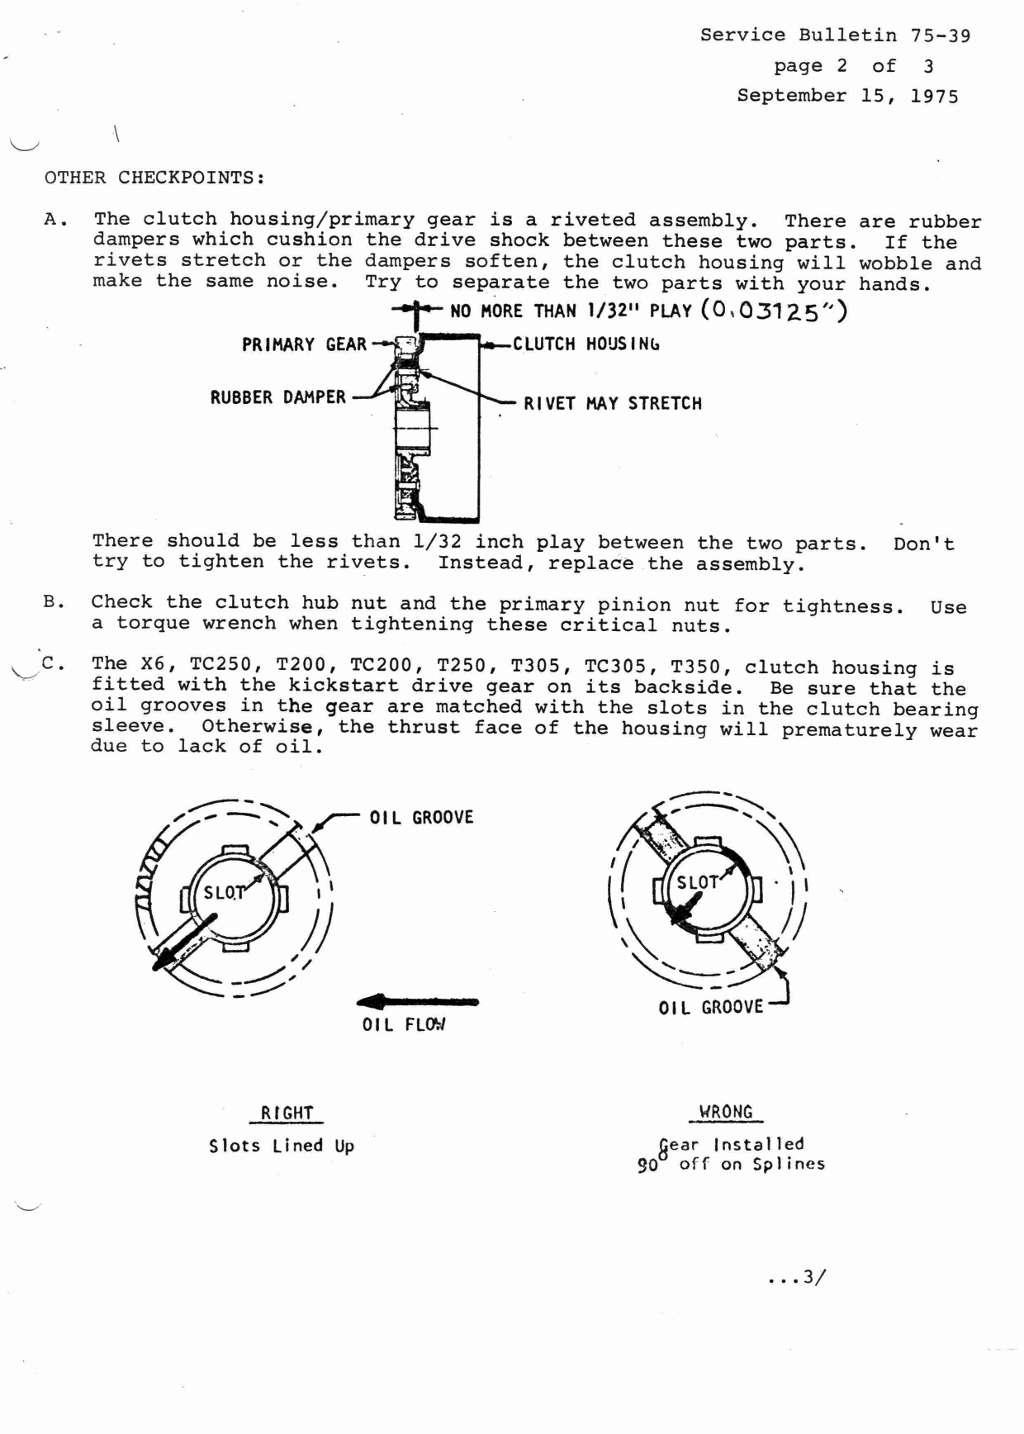 Suzuki Service Bulletins Torque Wrench Big Boss Bb 2000 40 160 Lbft 50 225nm 1974 1975 Canada